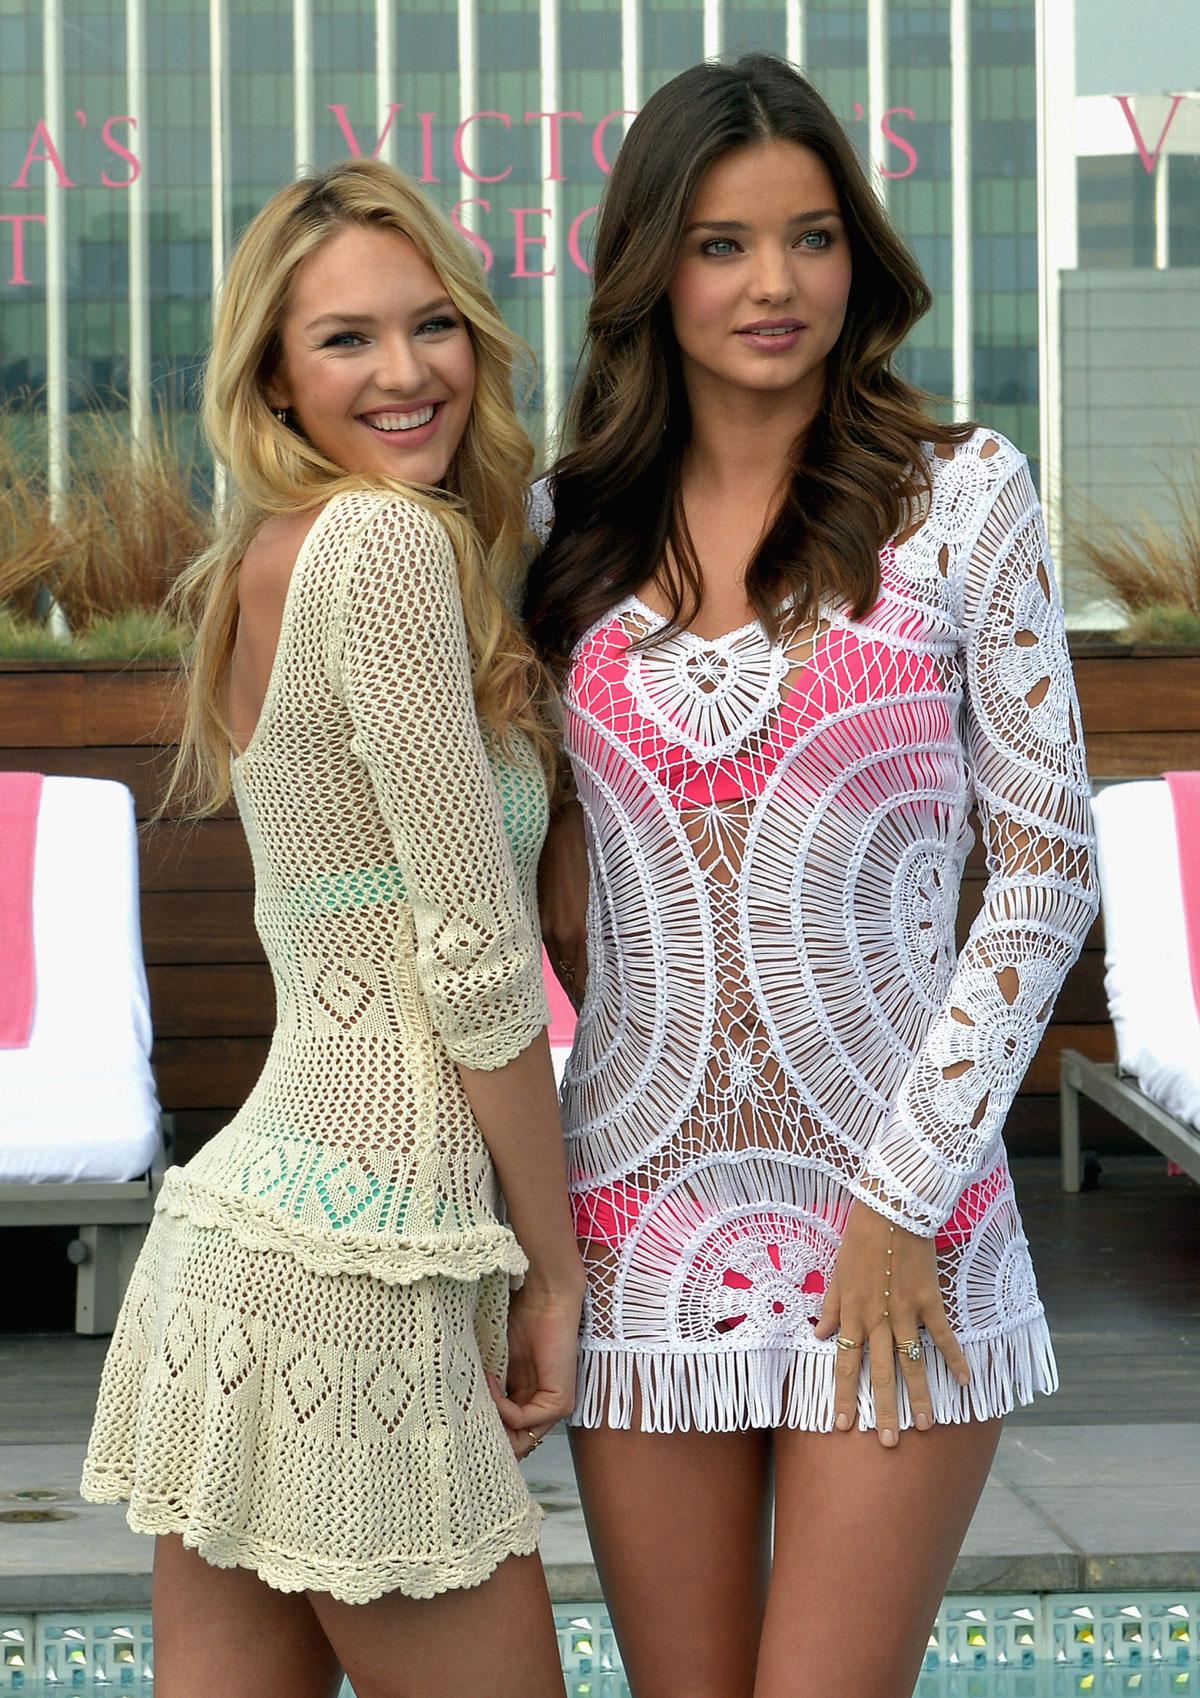 CANDICE SWANEPOEL and MIRANDA KERR at 2012 Victoria's ... Miranda Kerr Collection